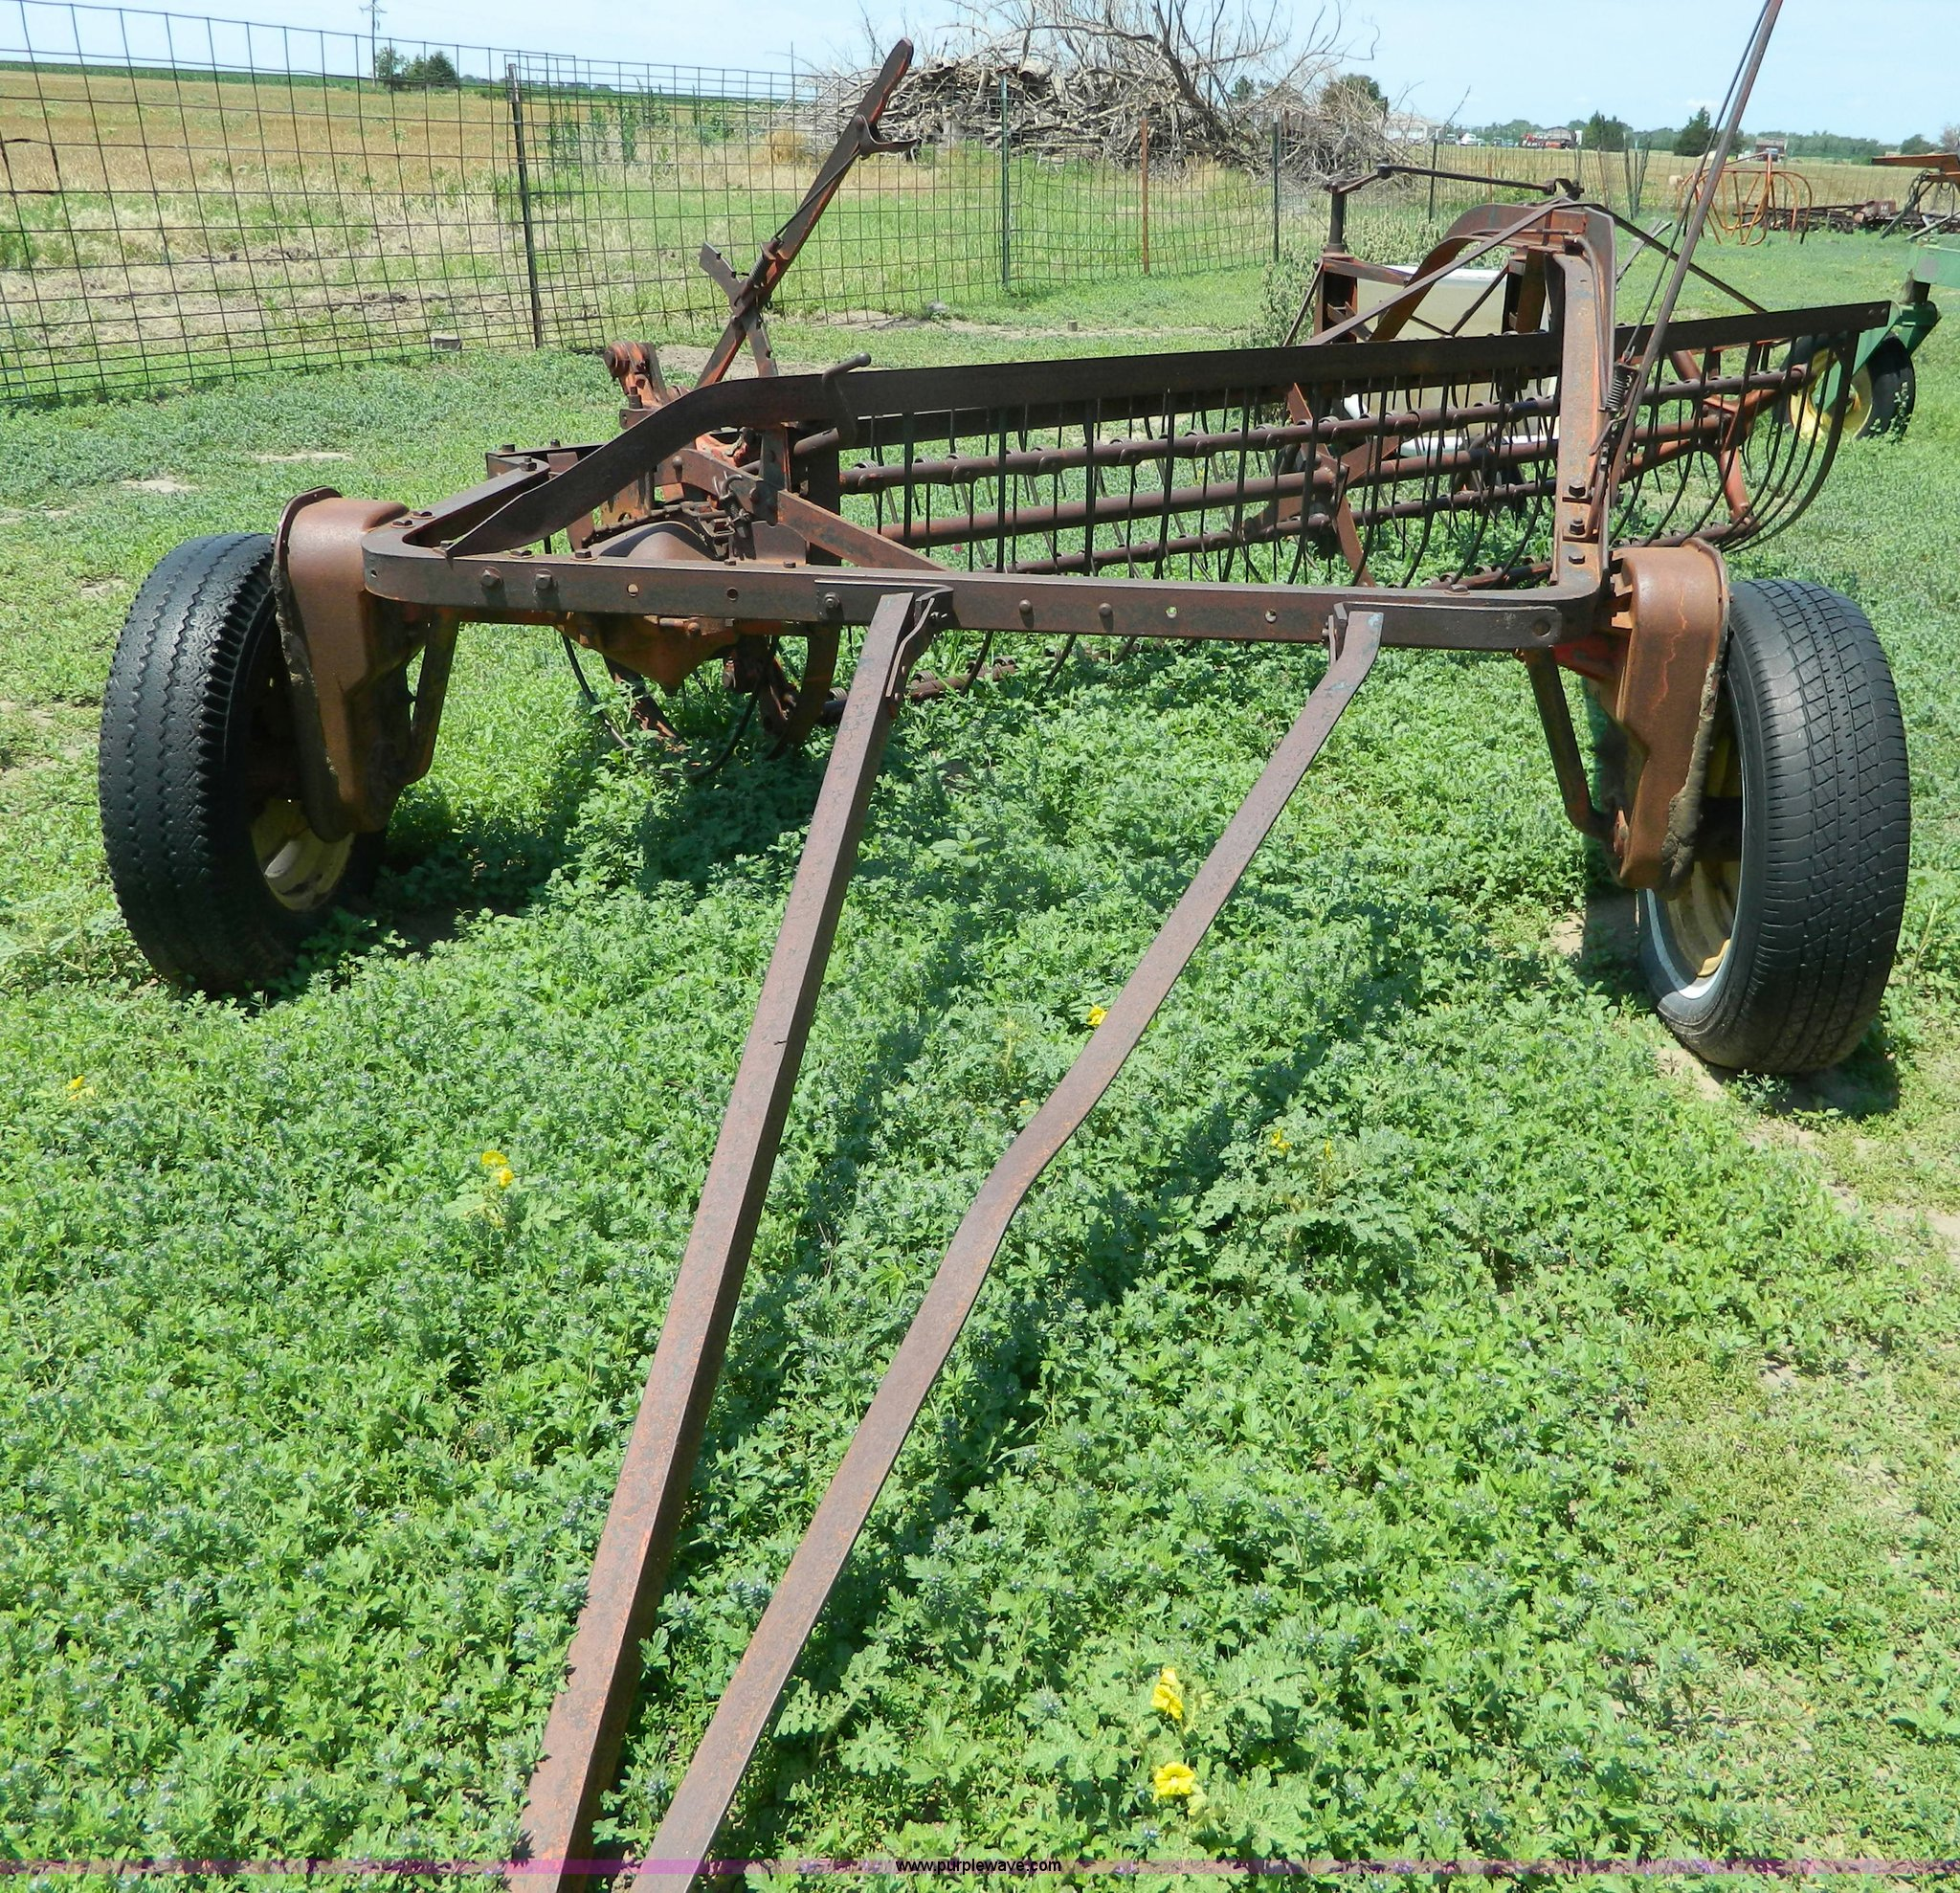 ... Massey-Harris 11 hay rake Full size in new window ...